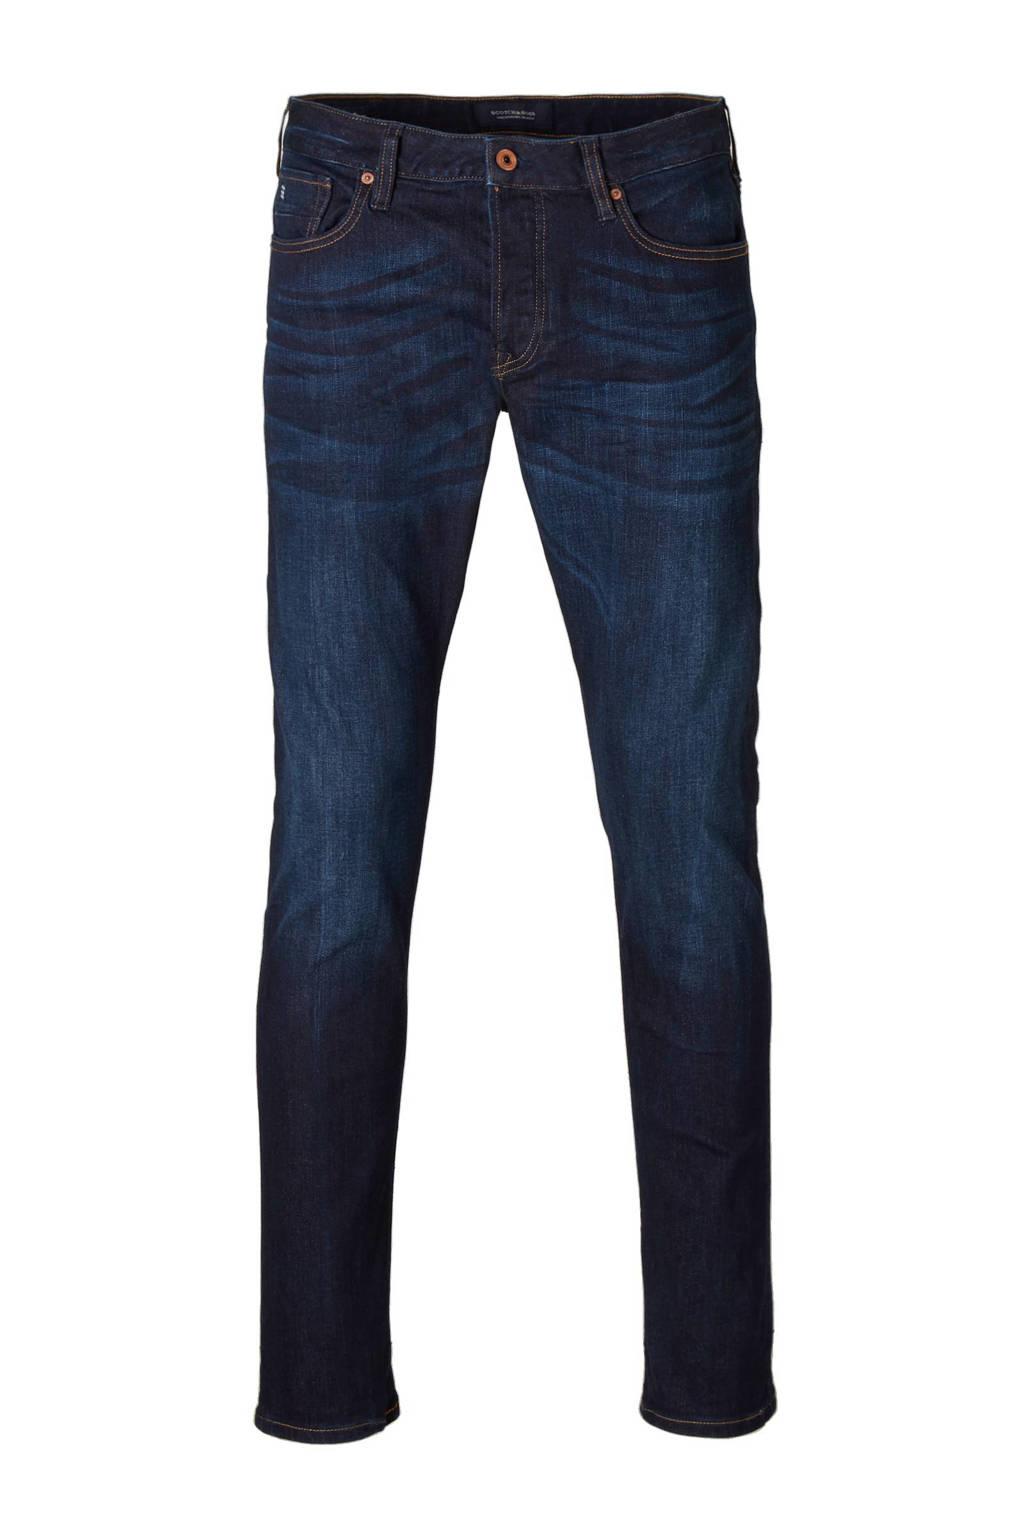 Scotch & Soda regular fit jeans Ralston, Beaten Back